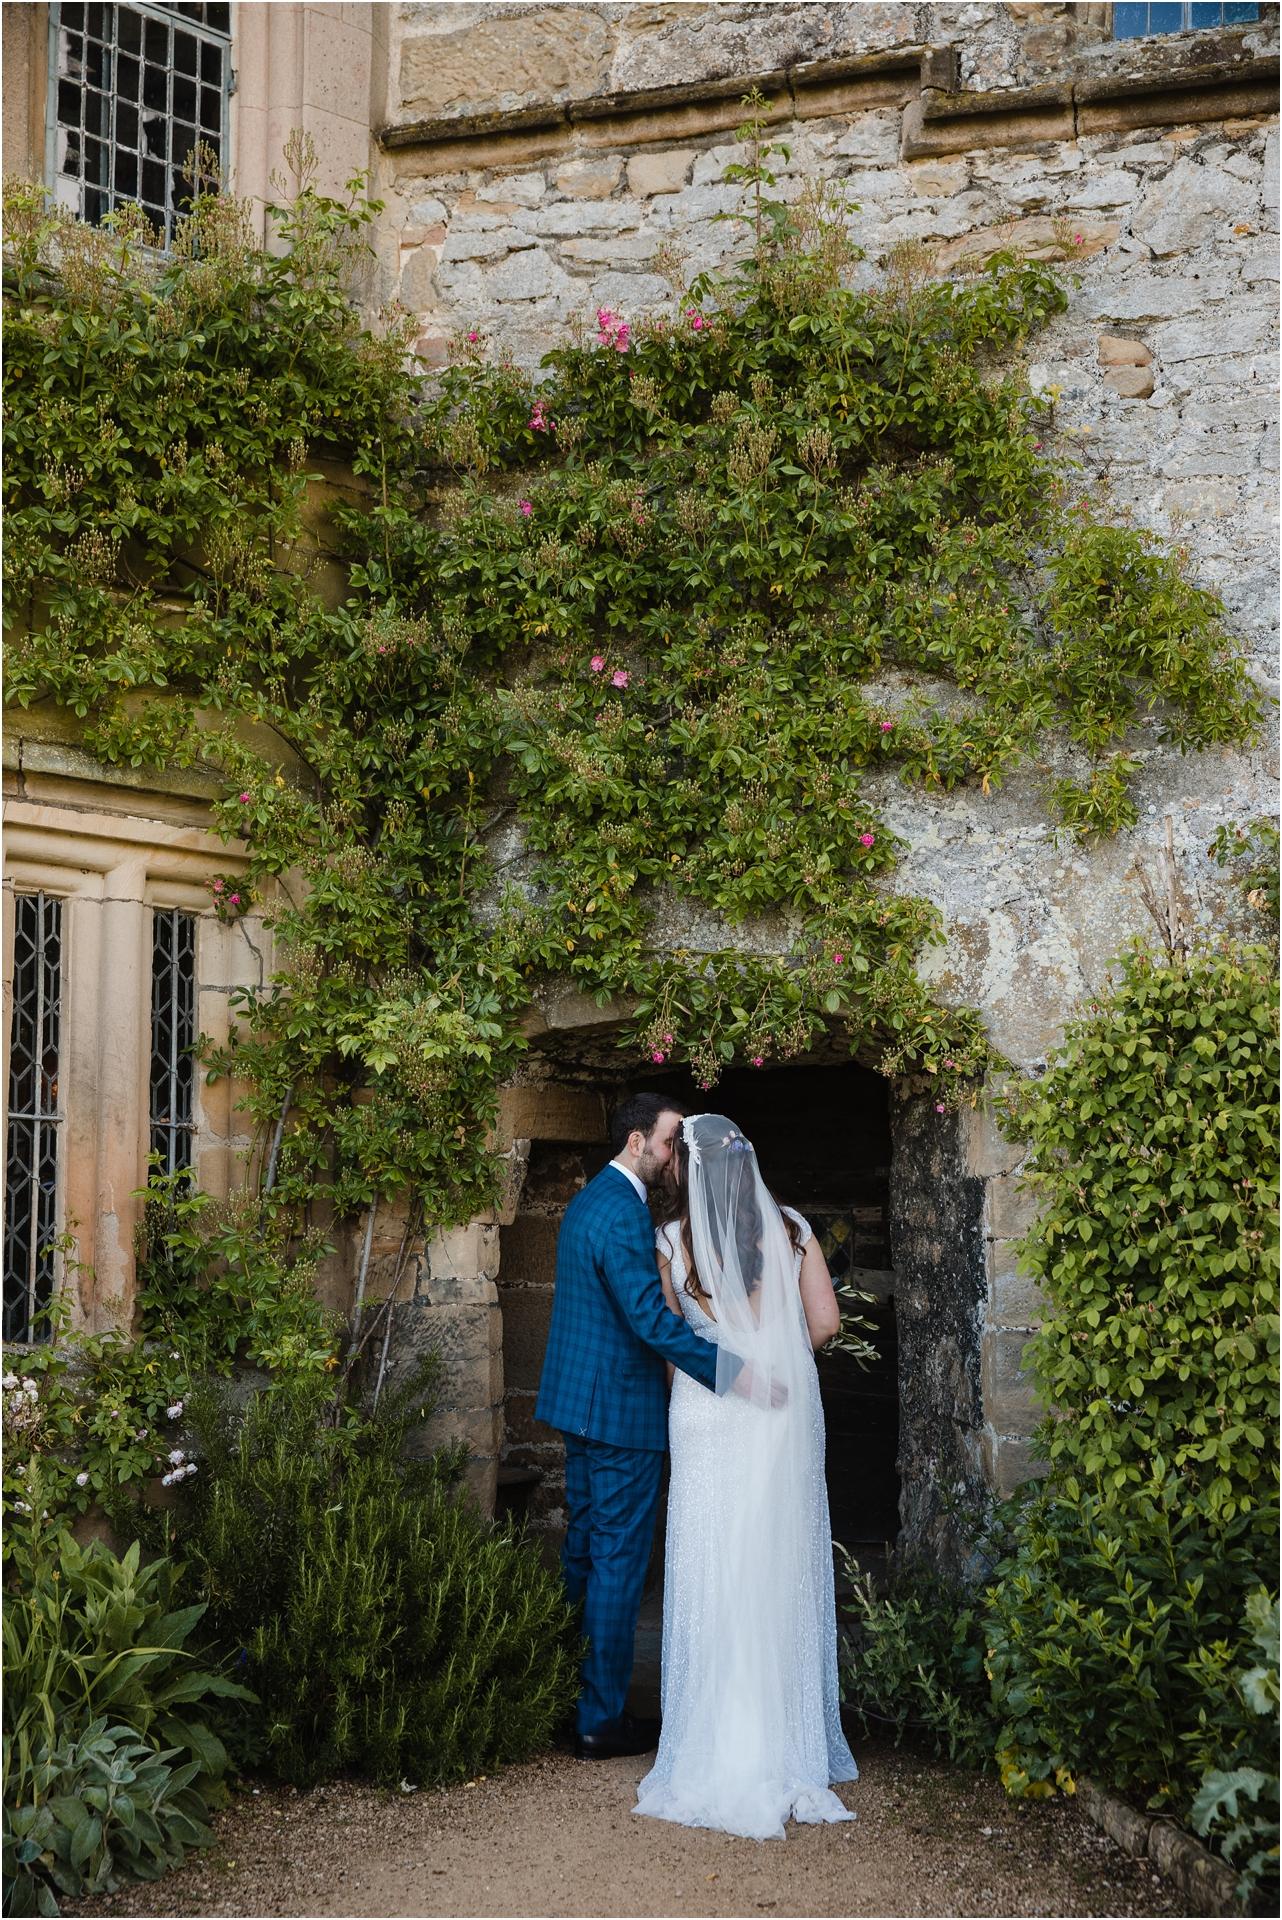 Wedding photography at Haddon Hall